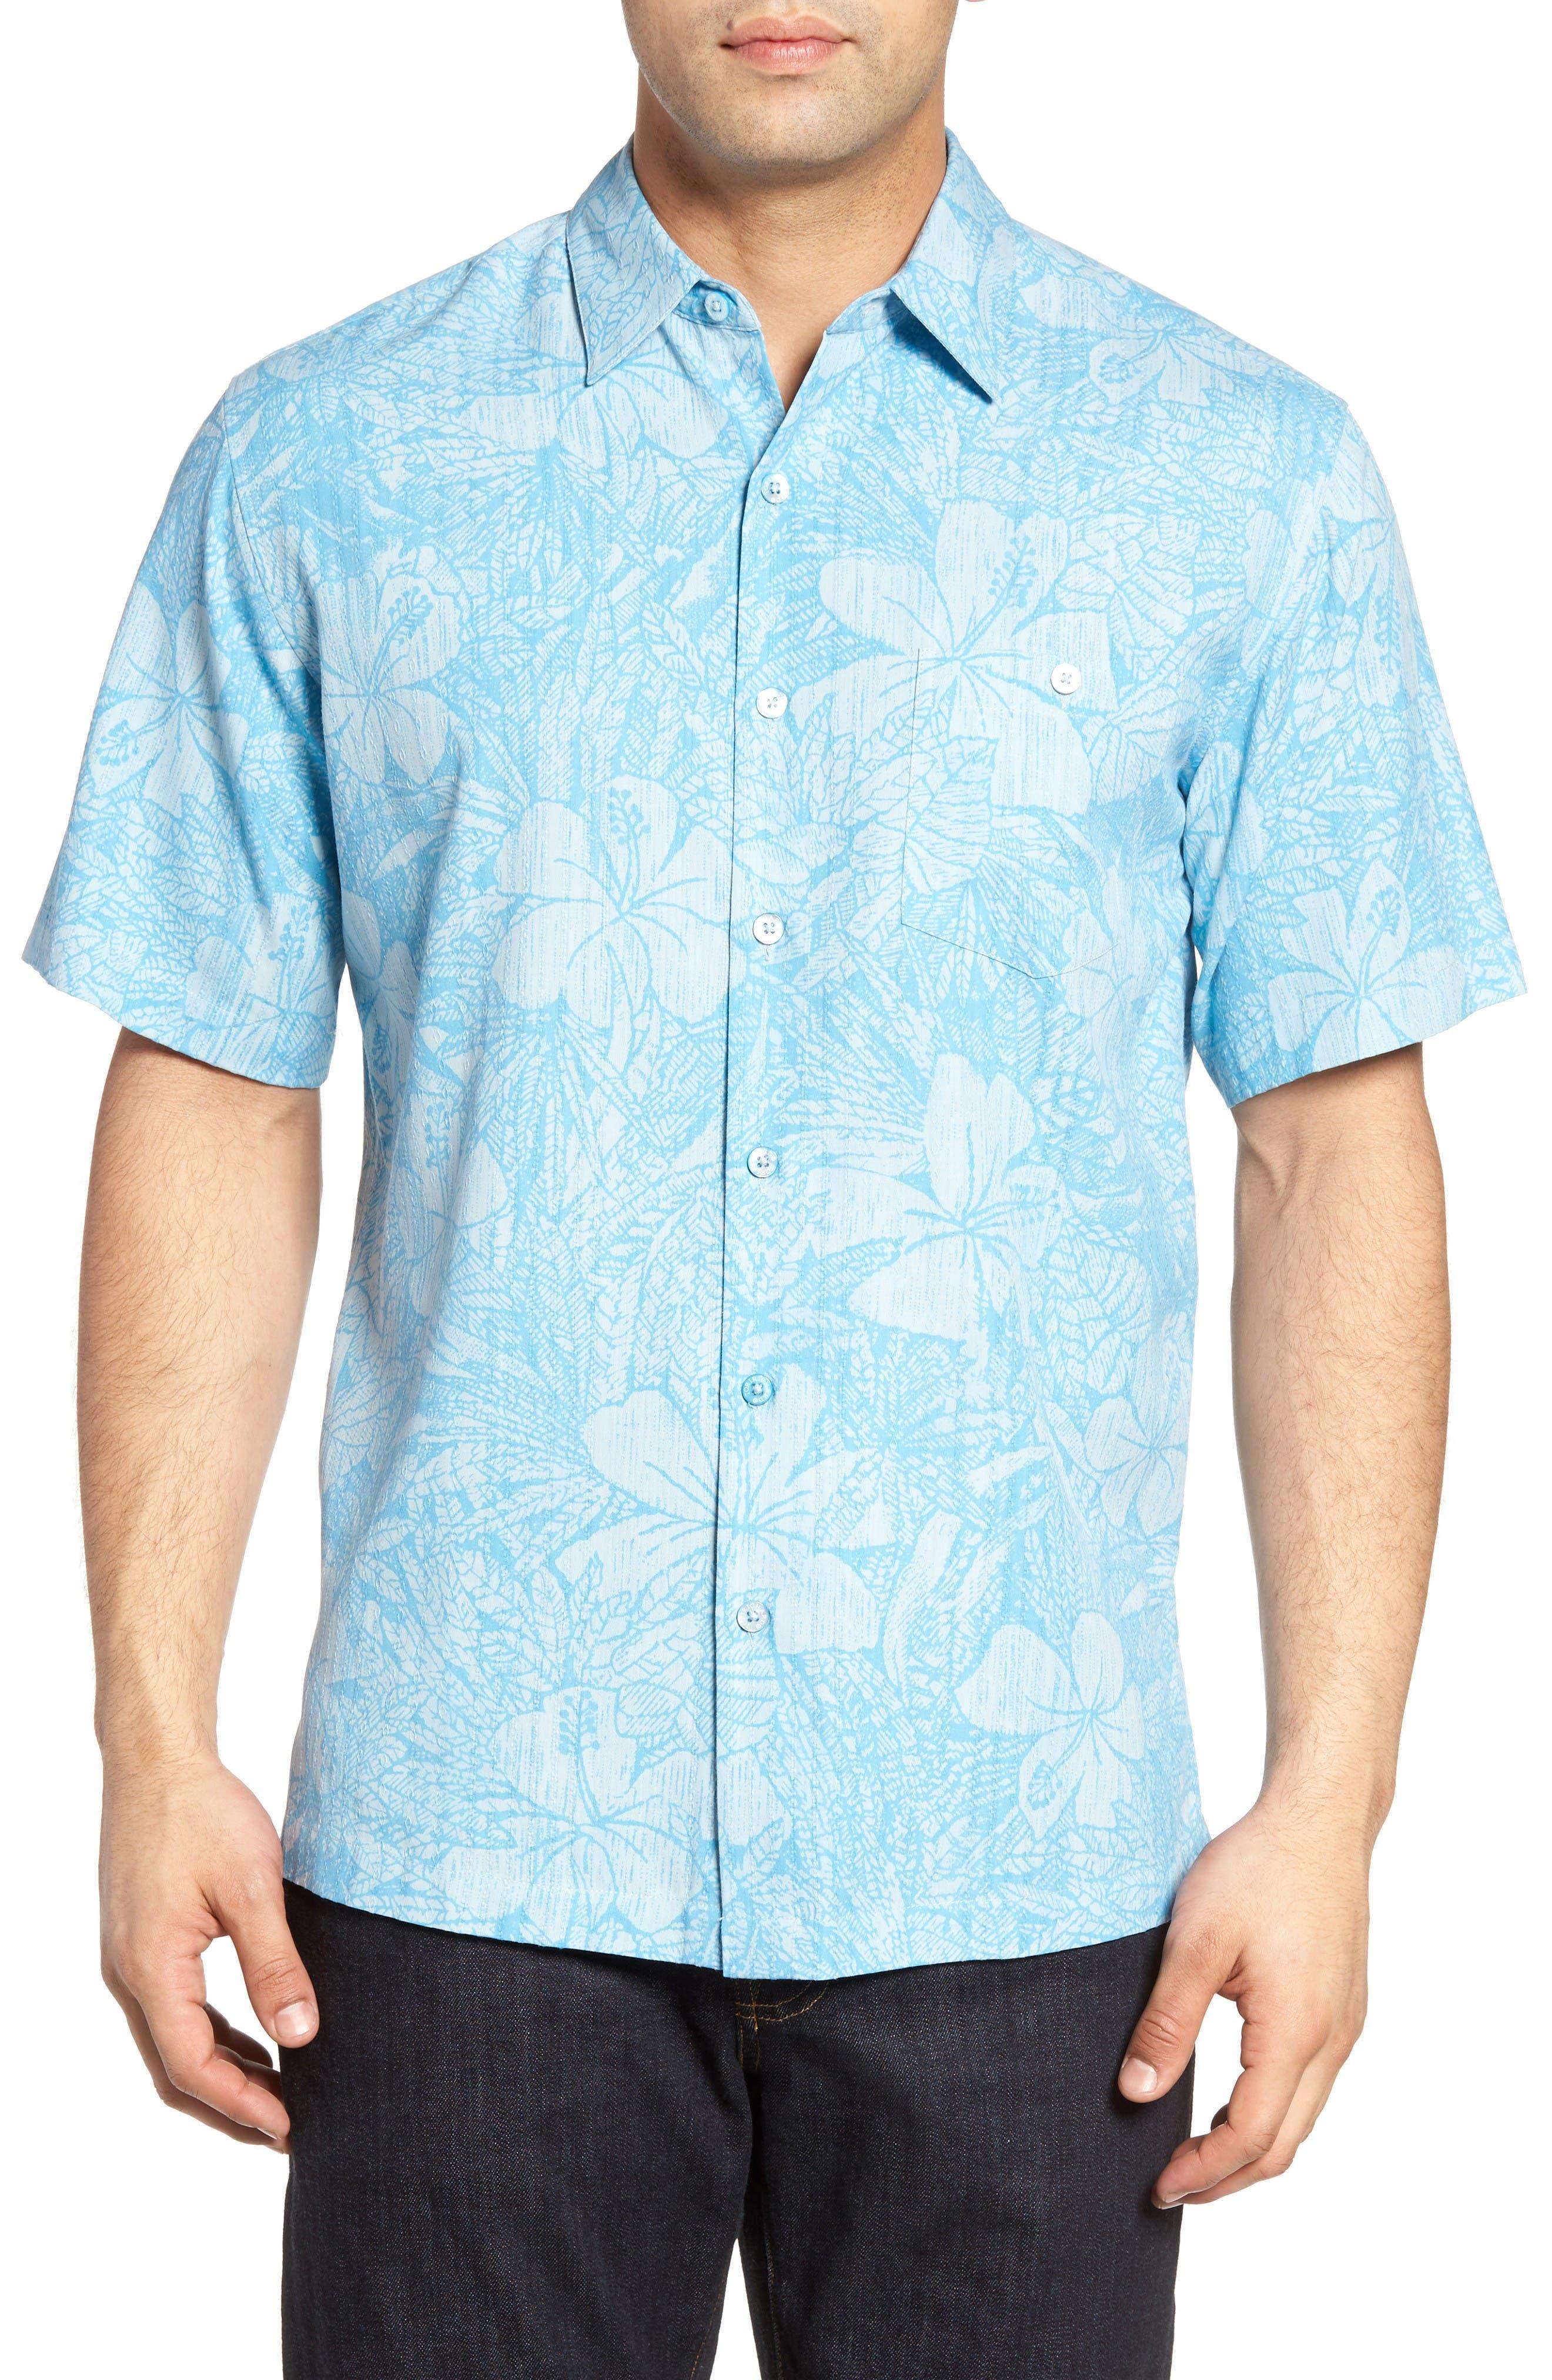 Tori Richard Incognito Silk Blend Camp Shirt